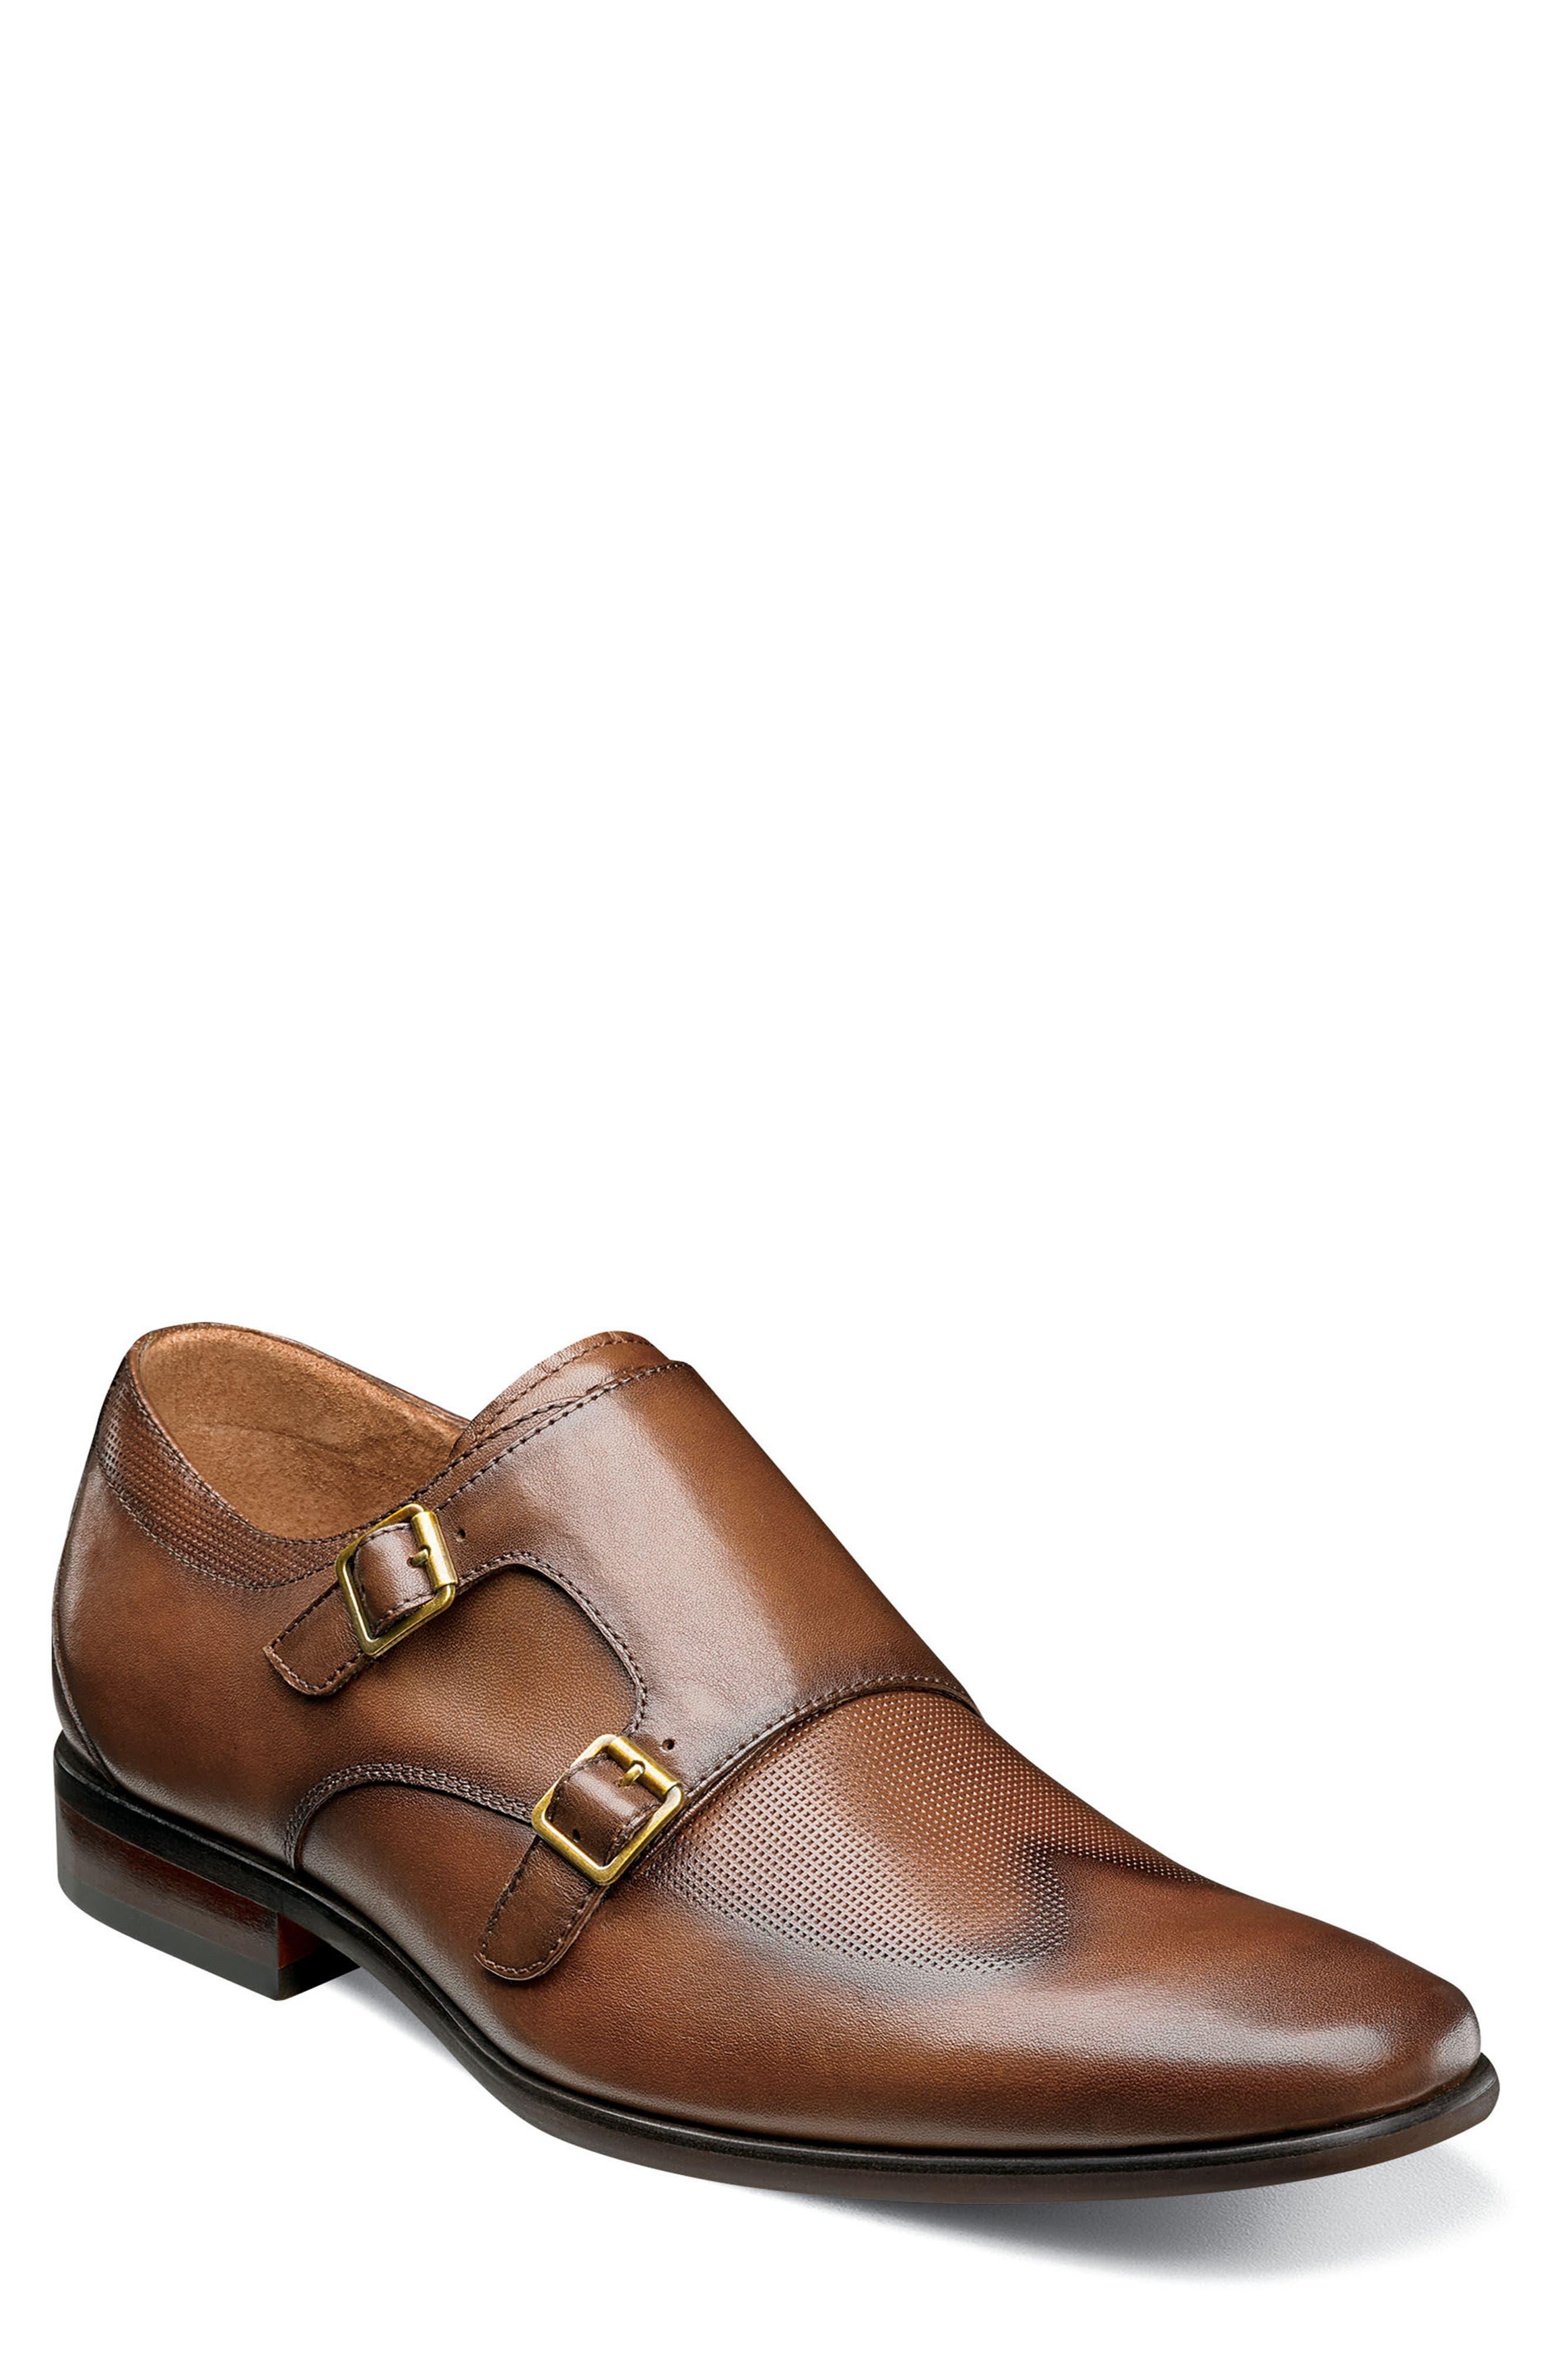 Postino Textured Double Strap Monk Shoe,                         Main,                         color, Cognac Leather